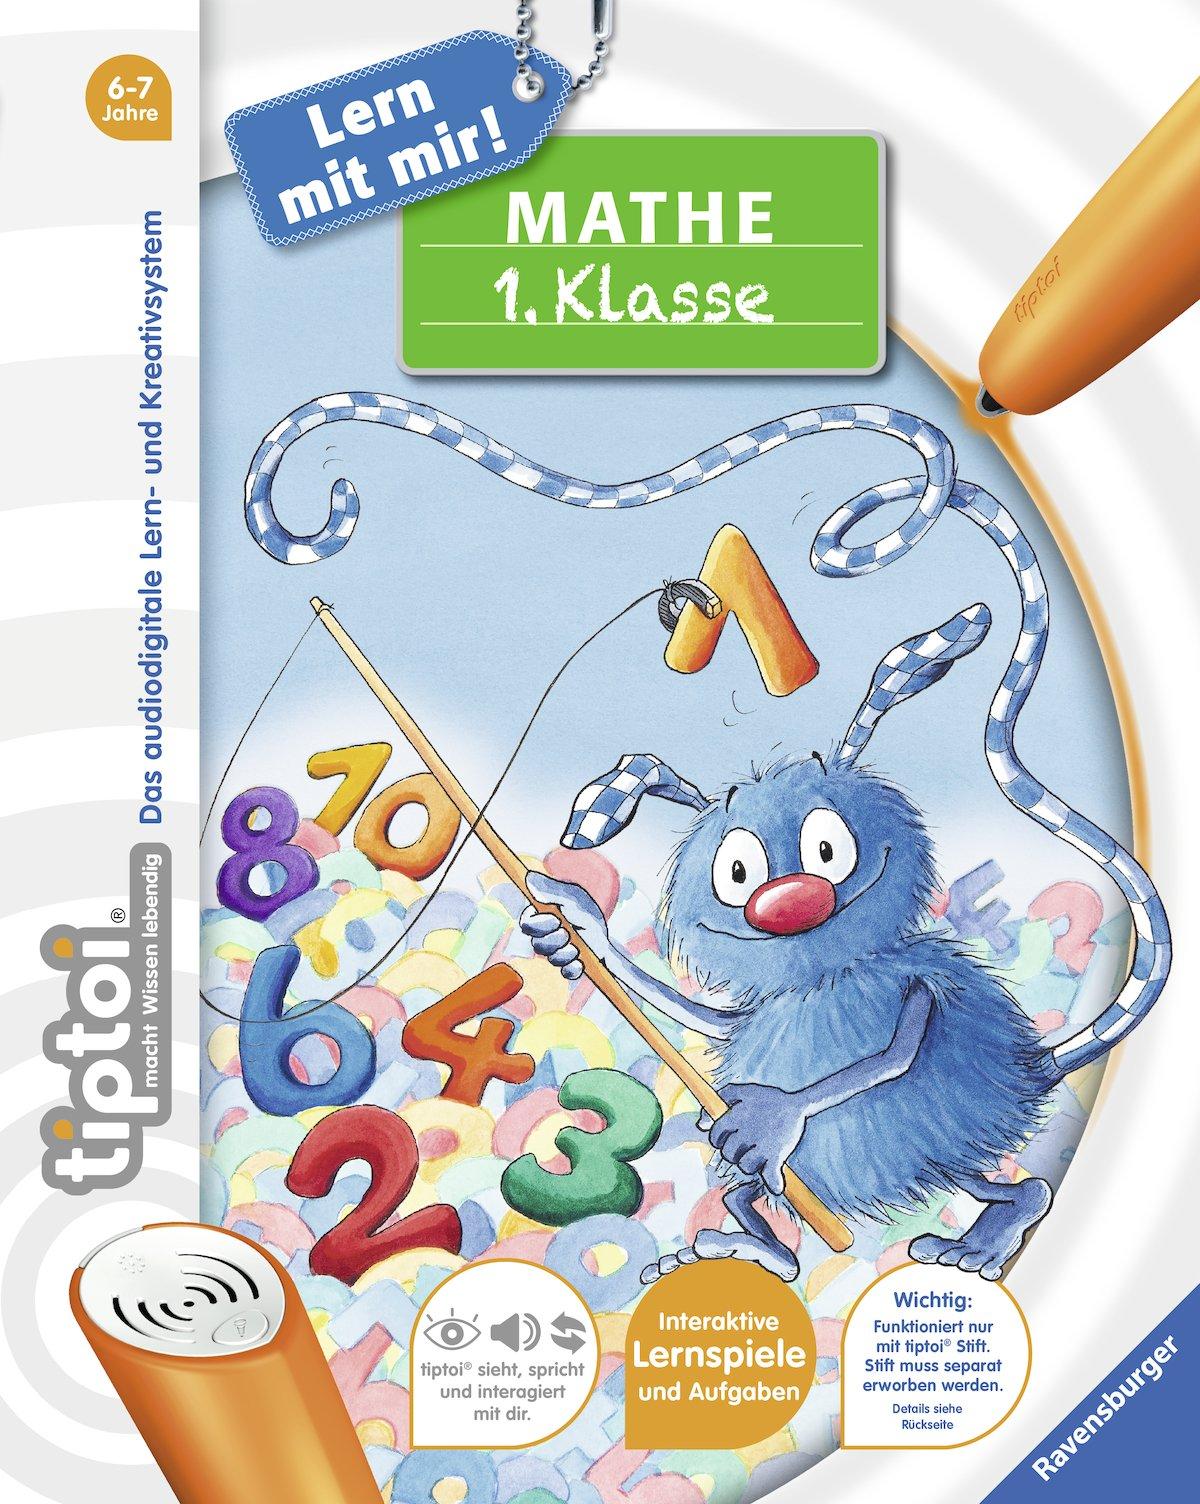 Tiptoi Mathe 1 Klasse 4005556006403 Amazon Com Books